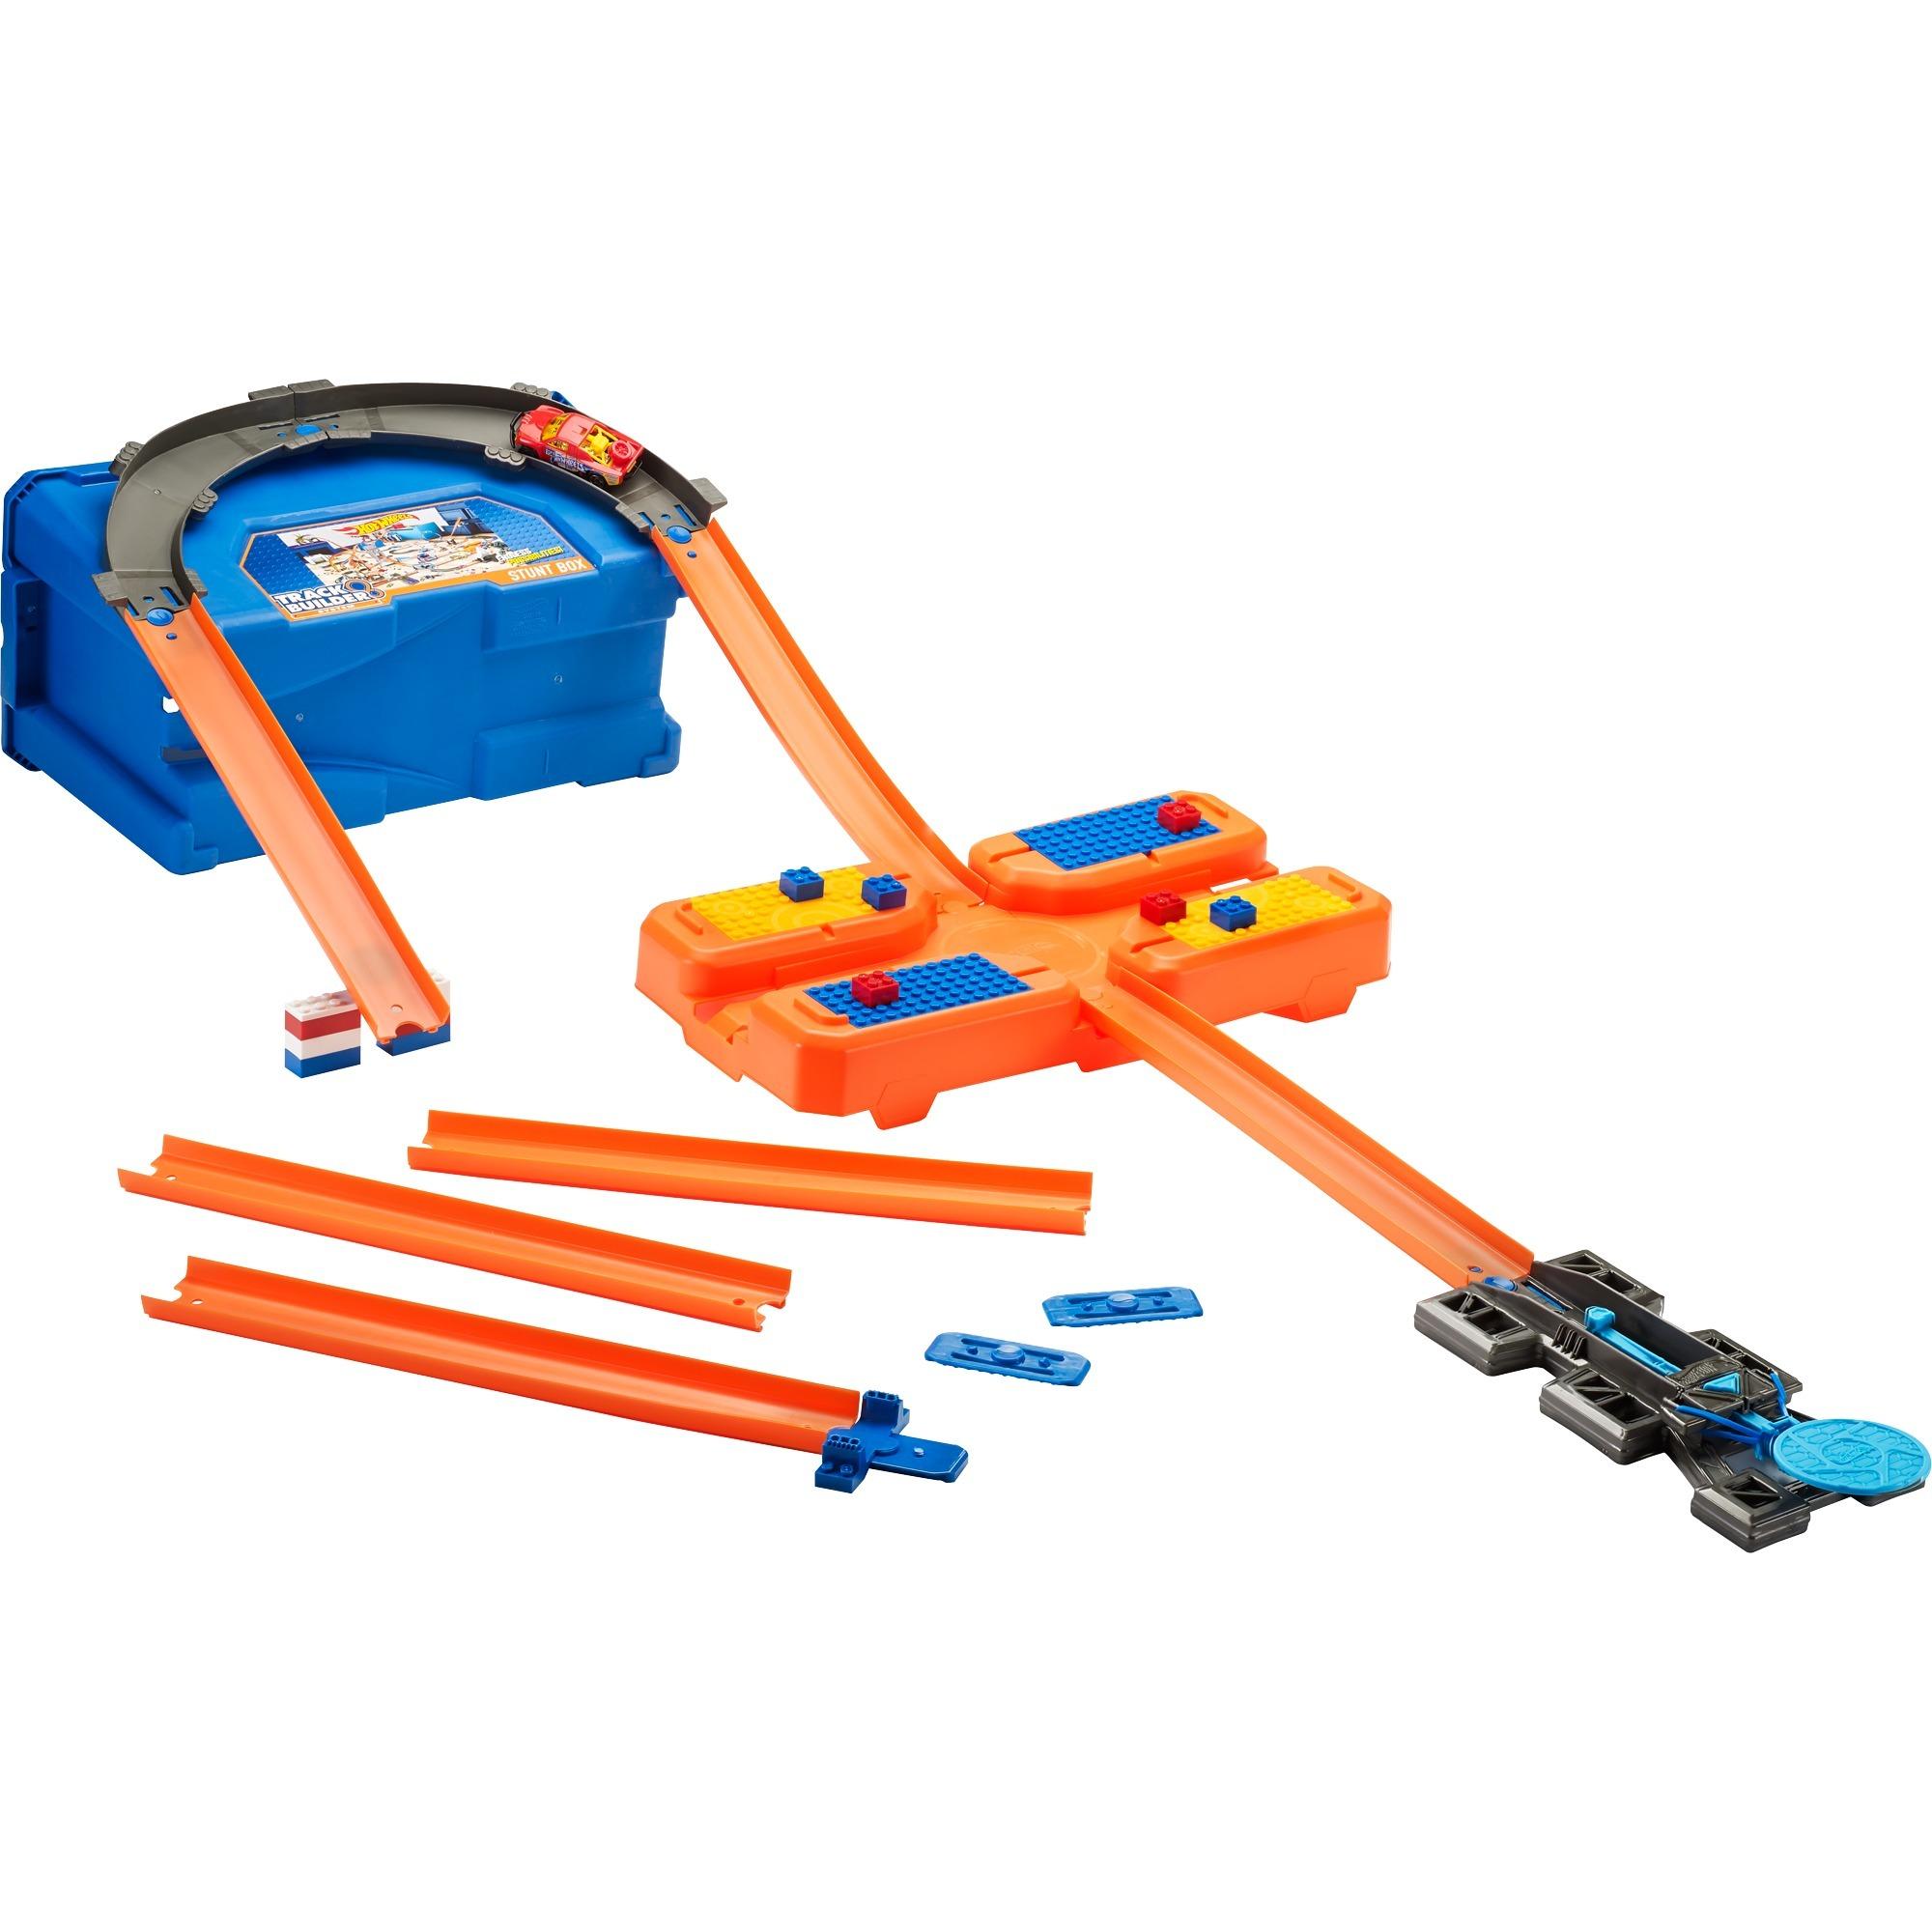 Hot Wheels - Caja Stunt - Track Builder